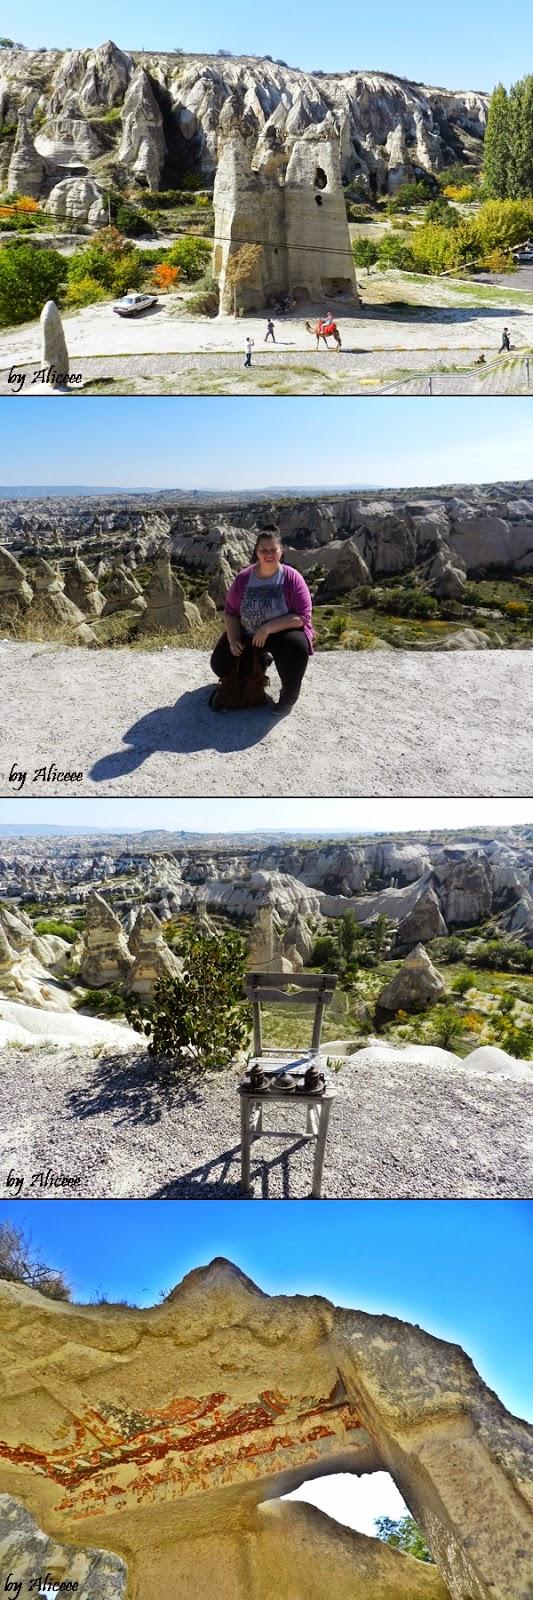 cappadocia-goreme-biserici-piatra-turcia